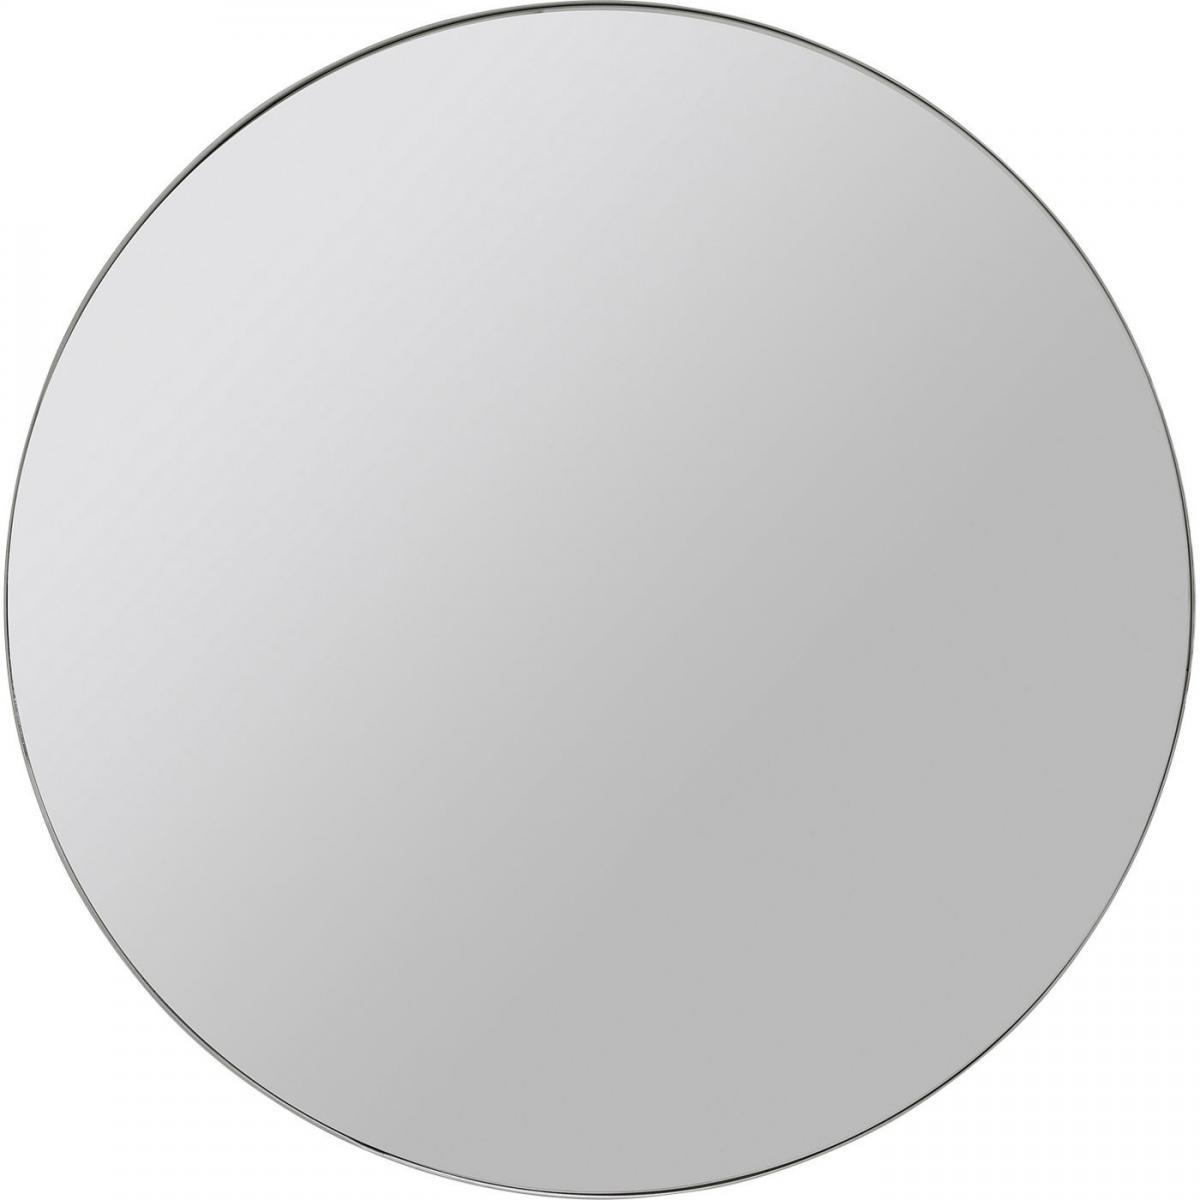 Karedesign Miroir Curve rond chrome 60cm Kare Design